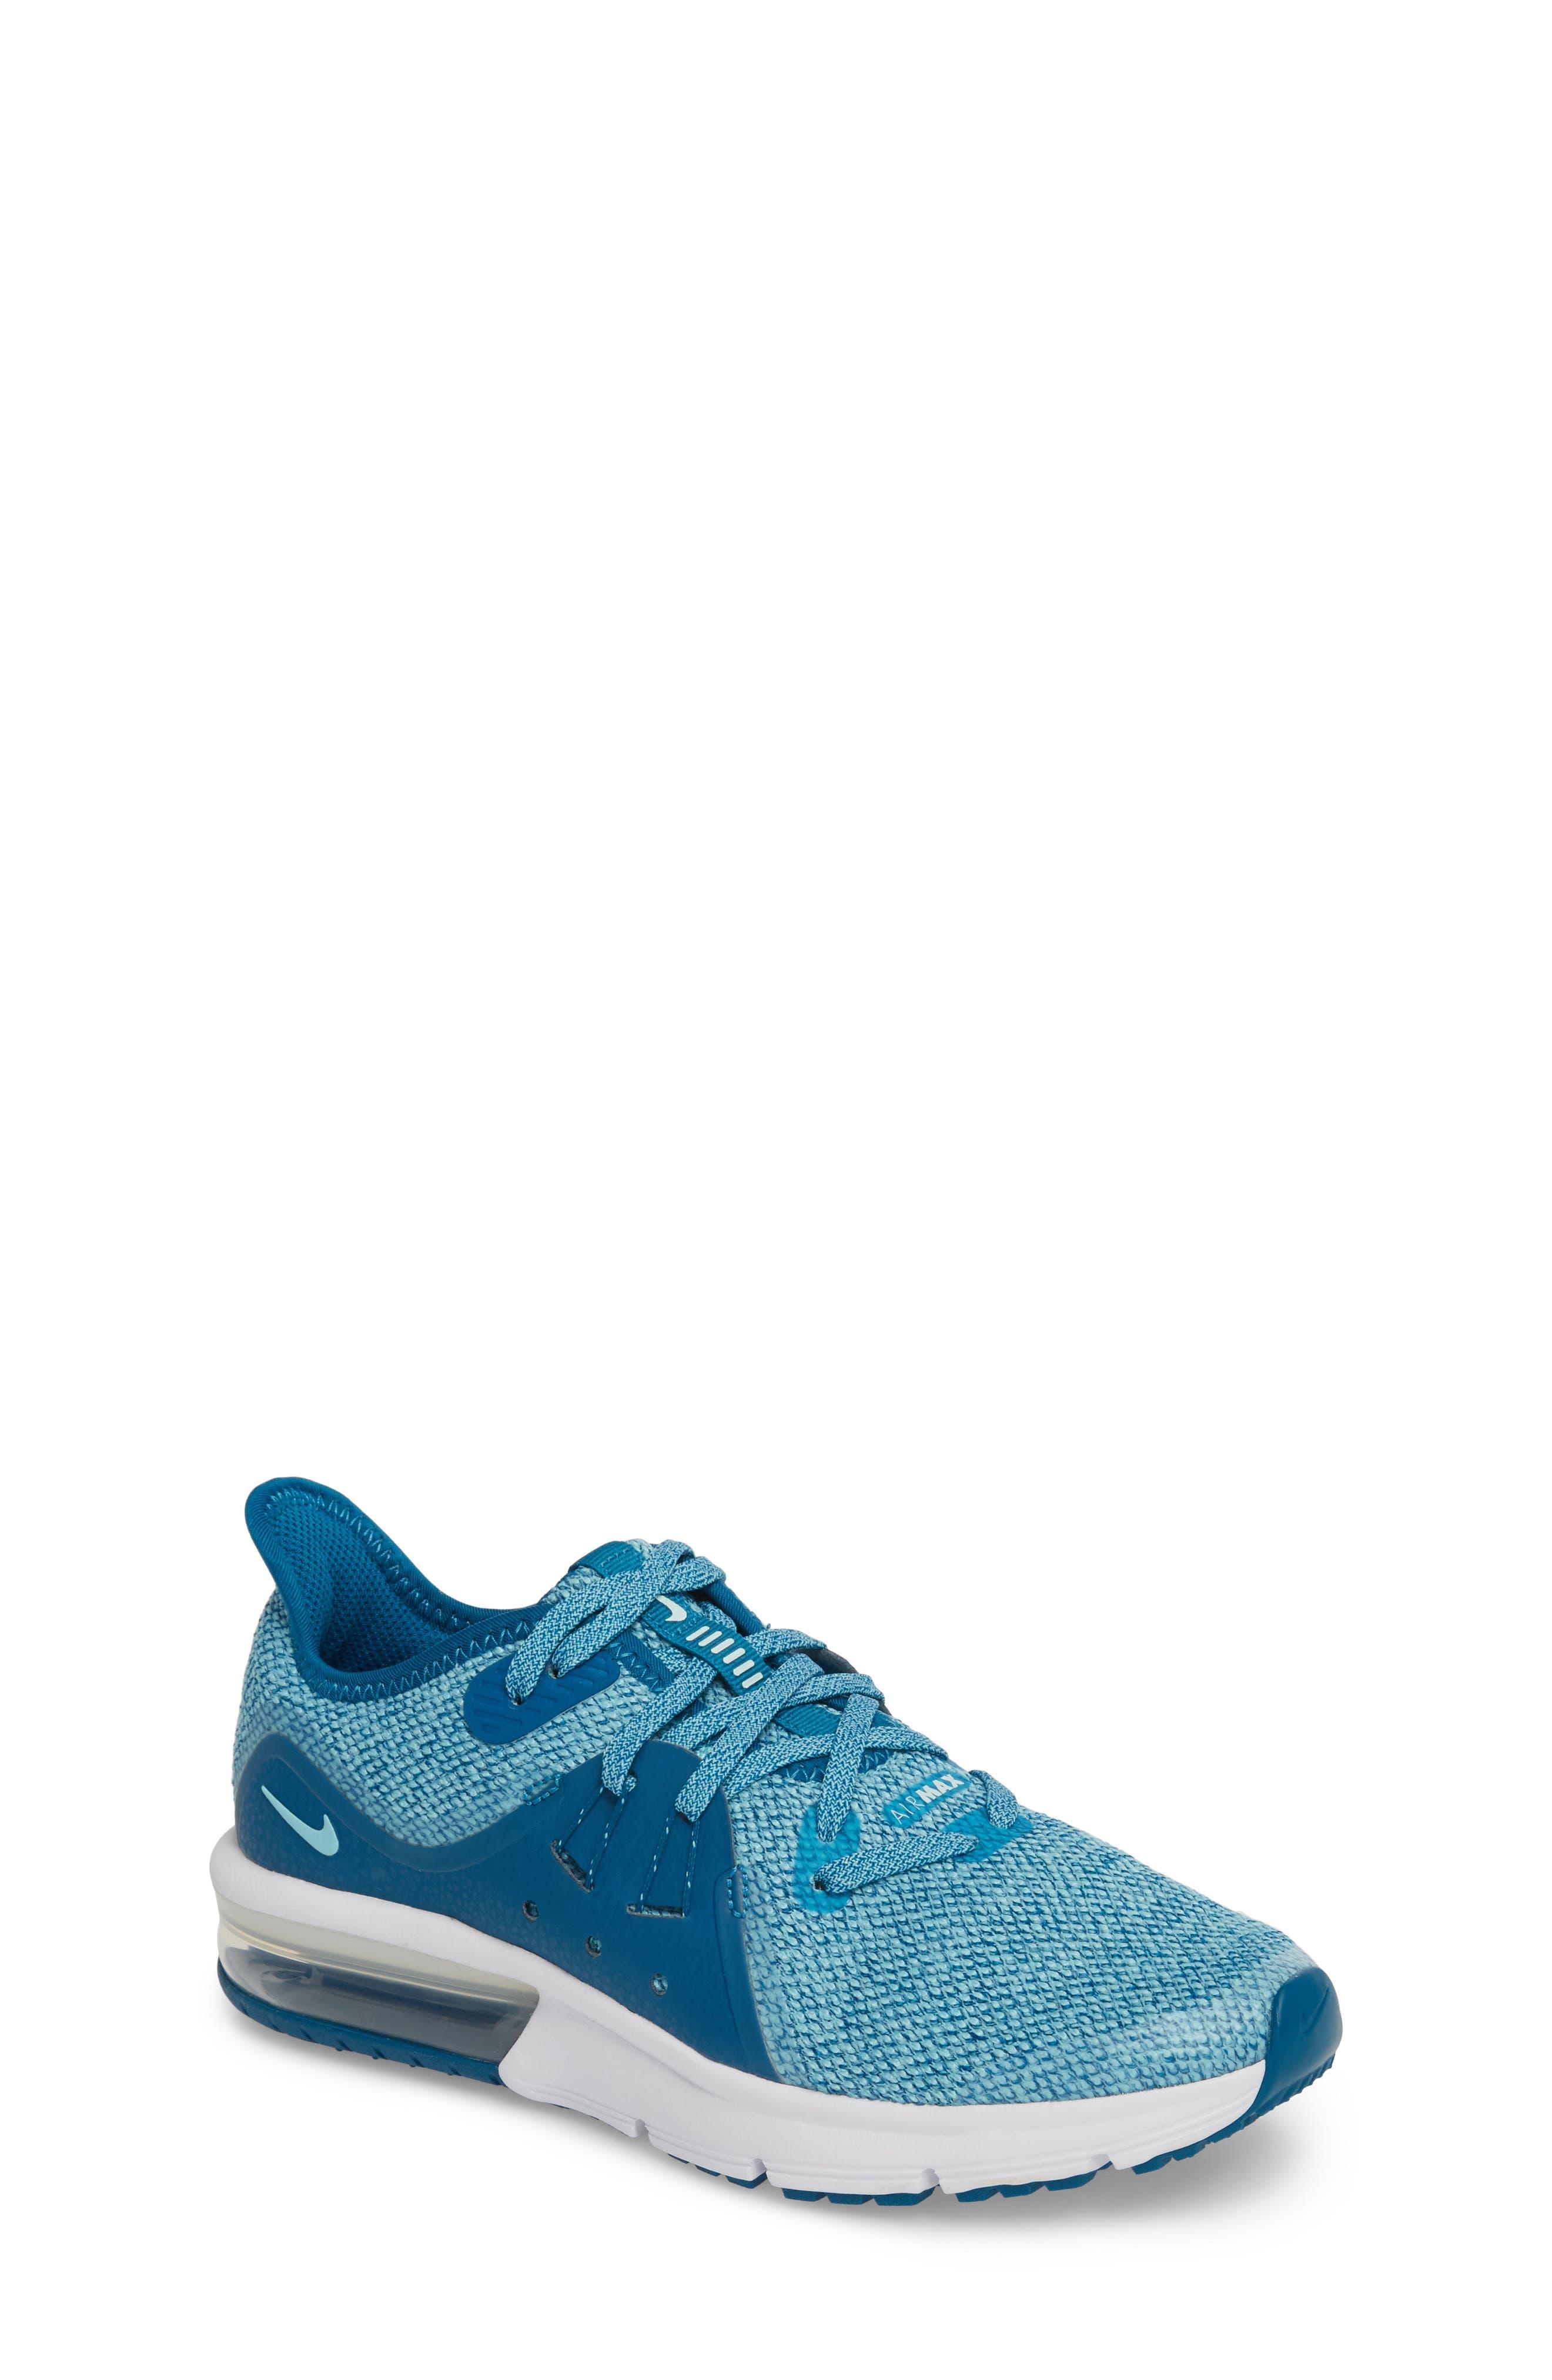 Air Max Sequent 3 GS Running Shoe,                         Main,                         color, Green/ Igloo/ Bleached Aqua